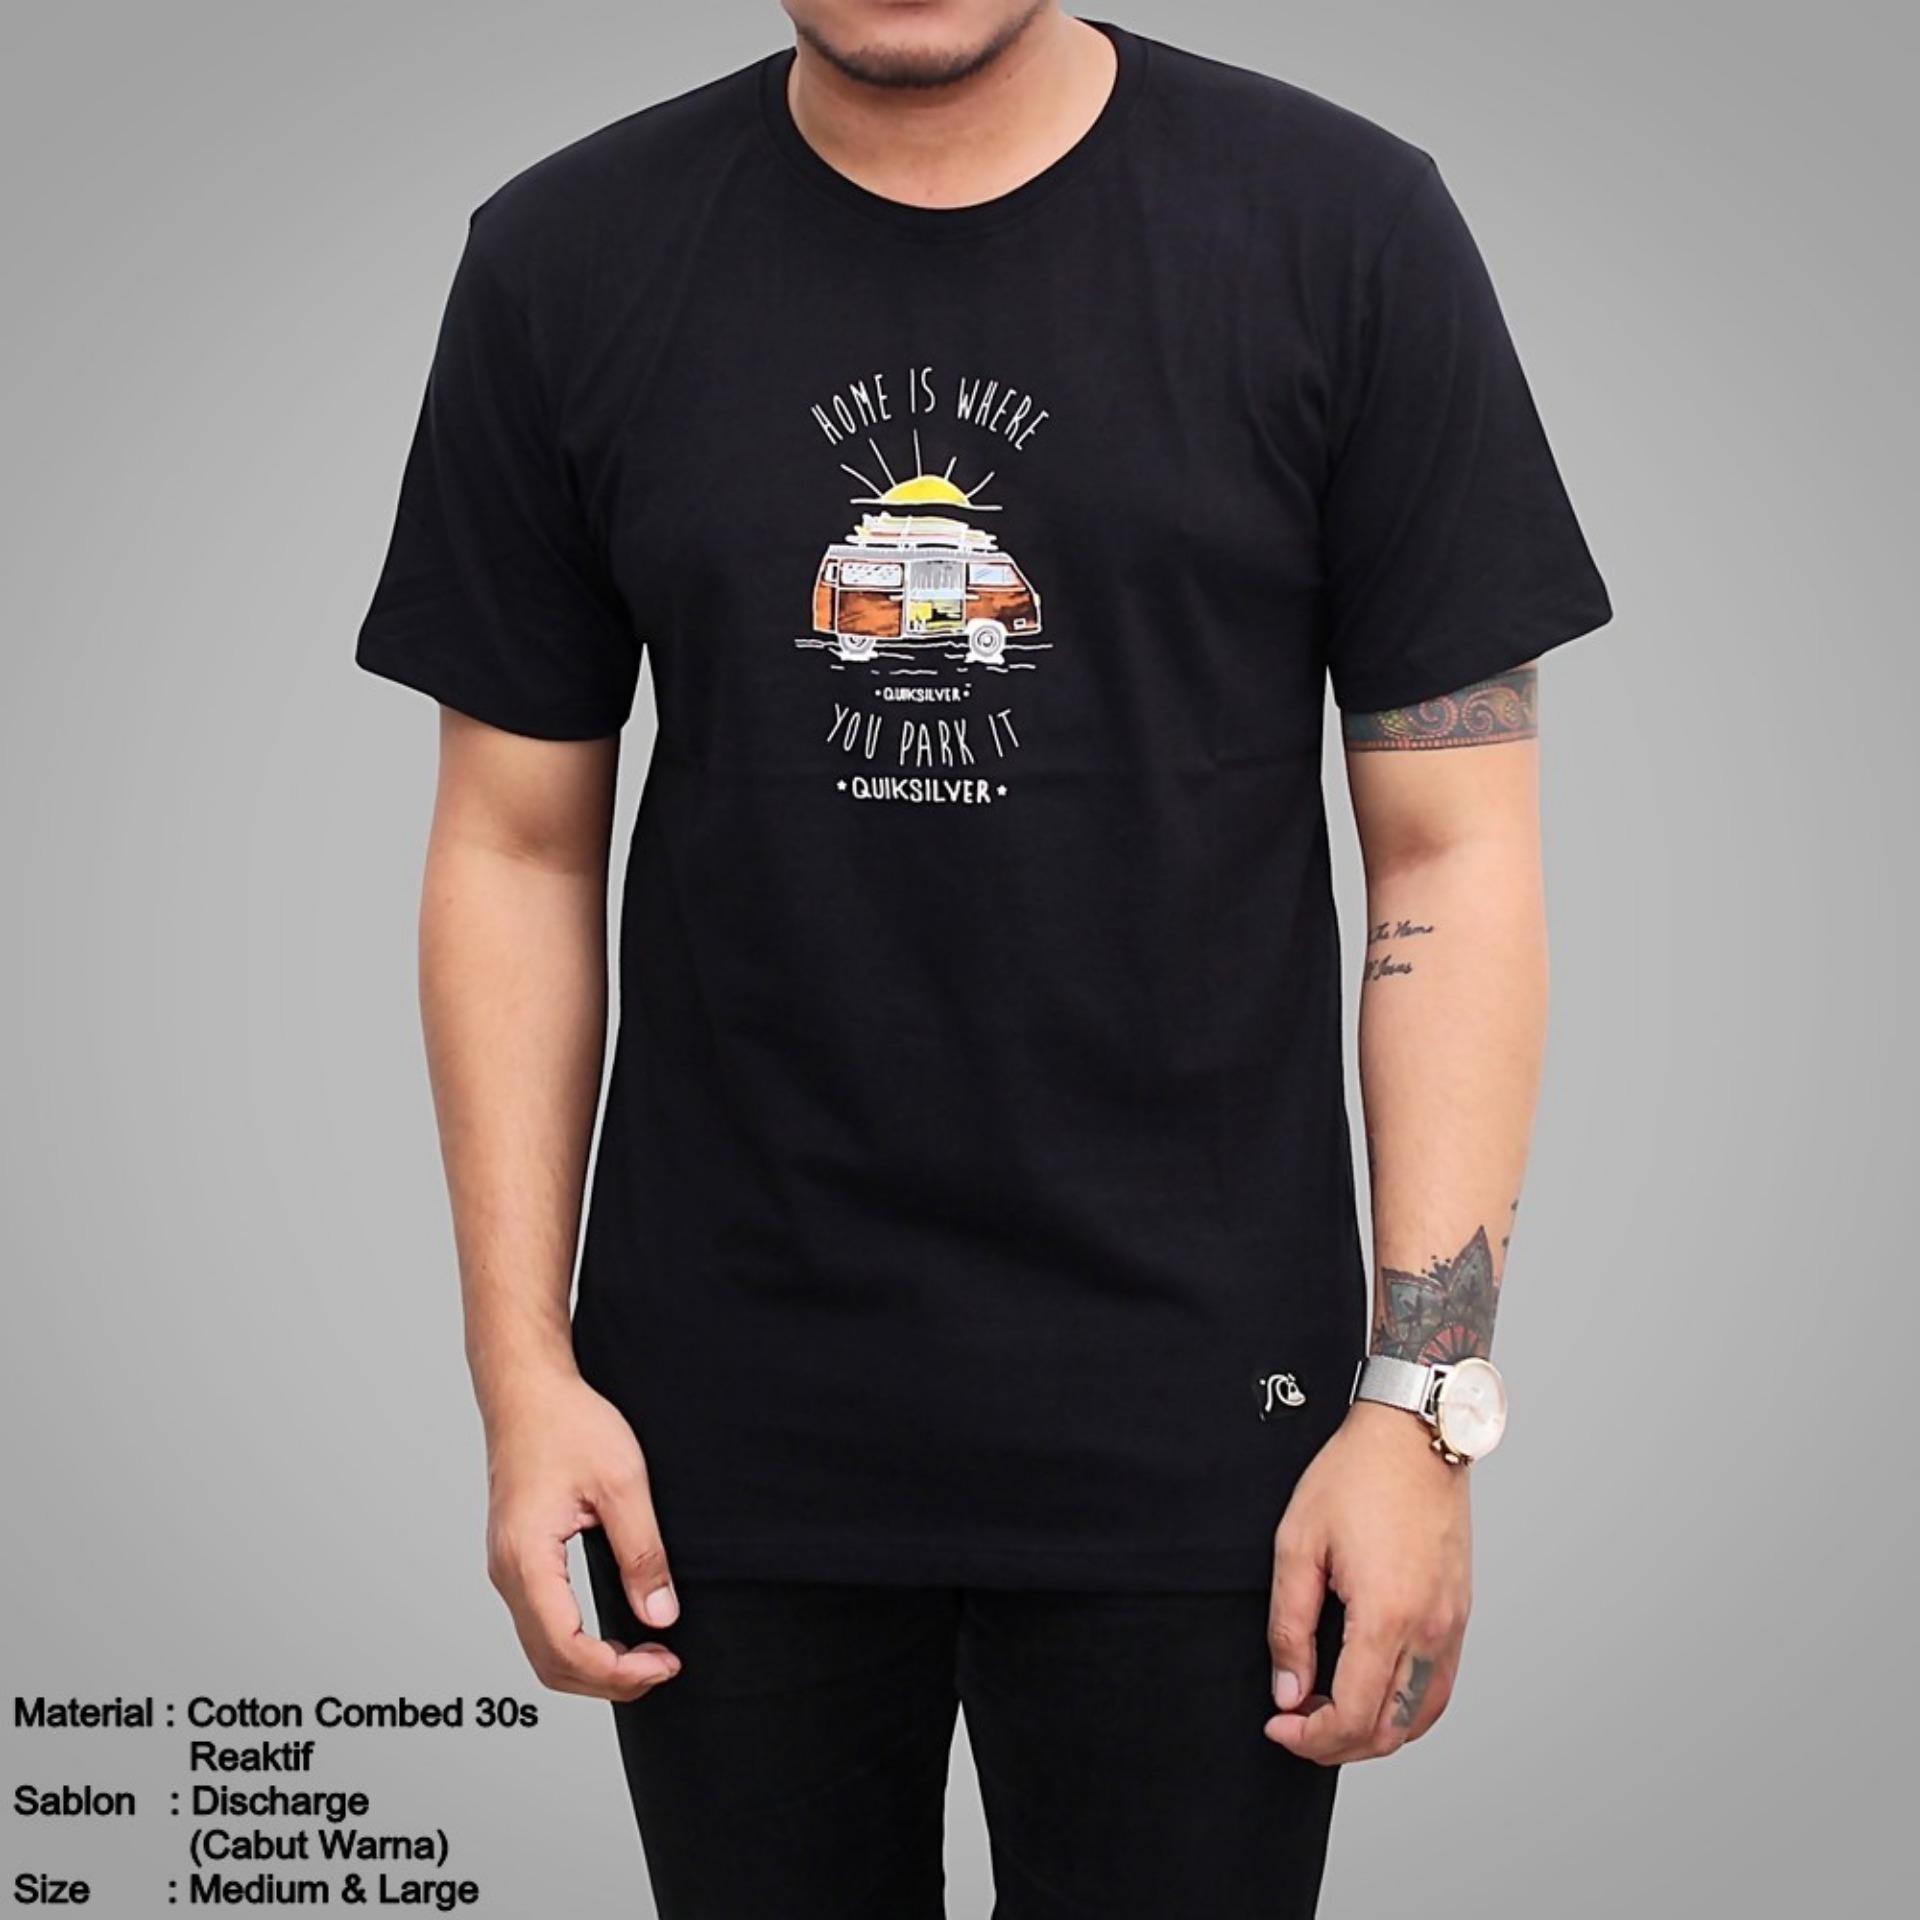 Tshirt Pria / Distro Pria / Baju Pria Premium / Kaos Pria Murah .